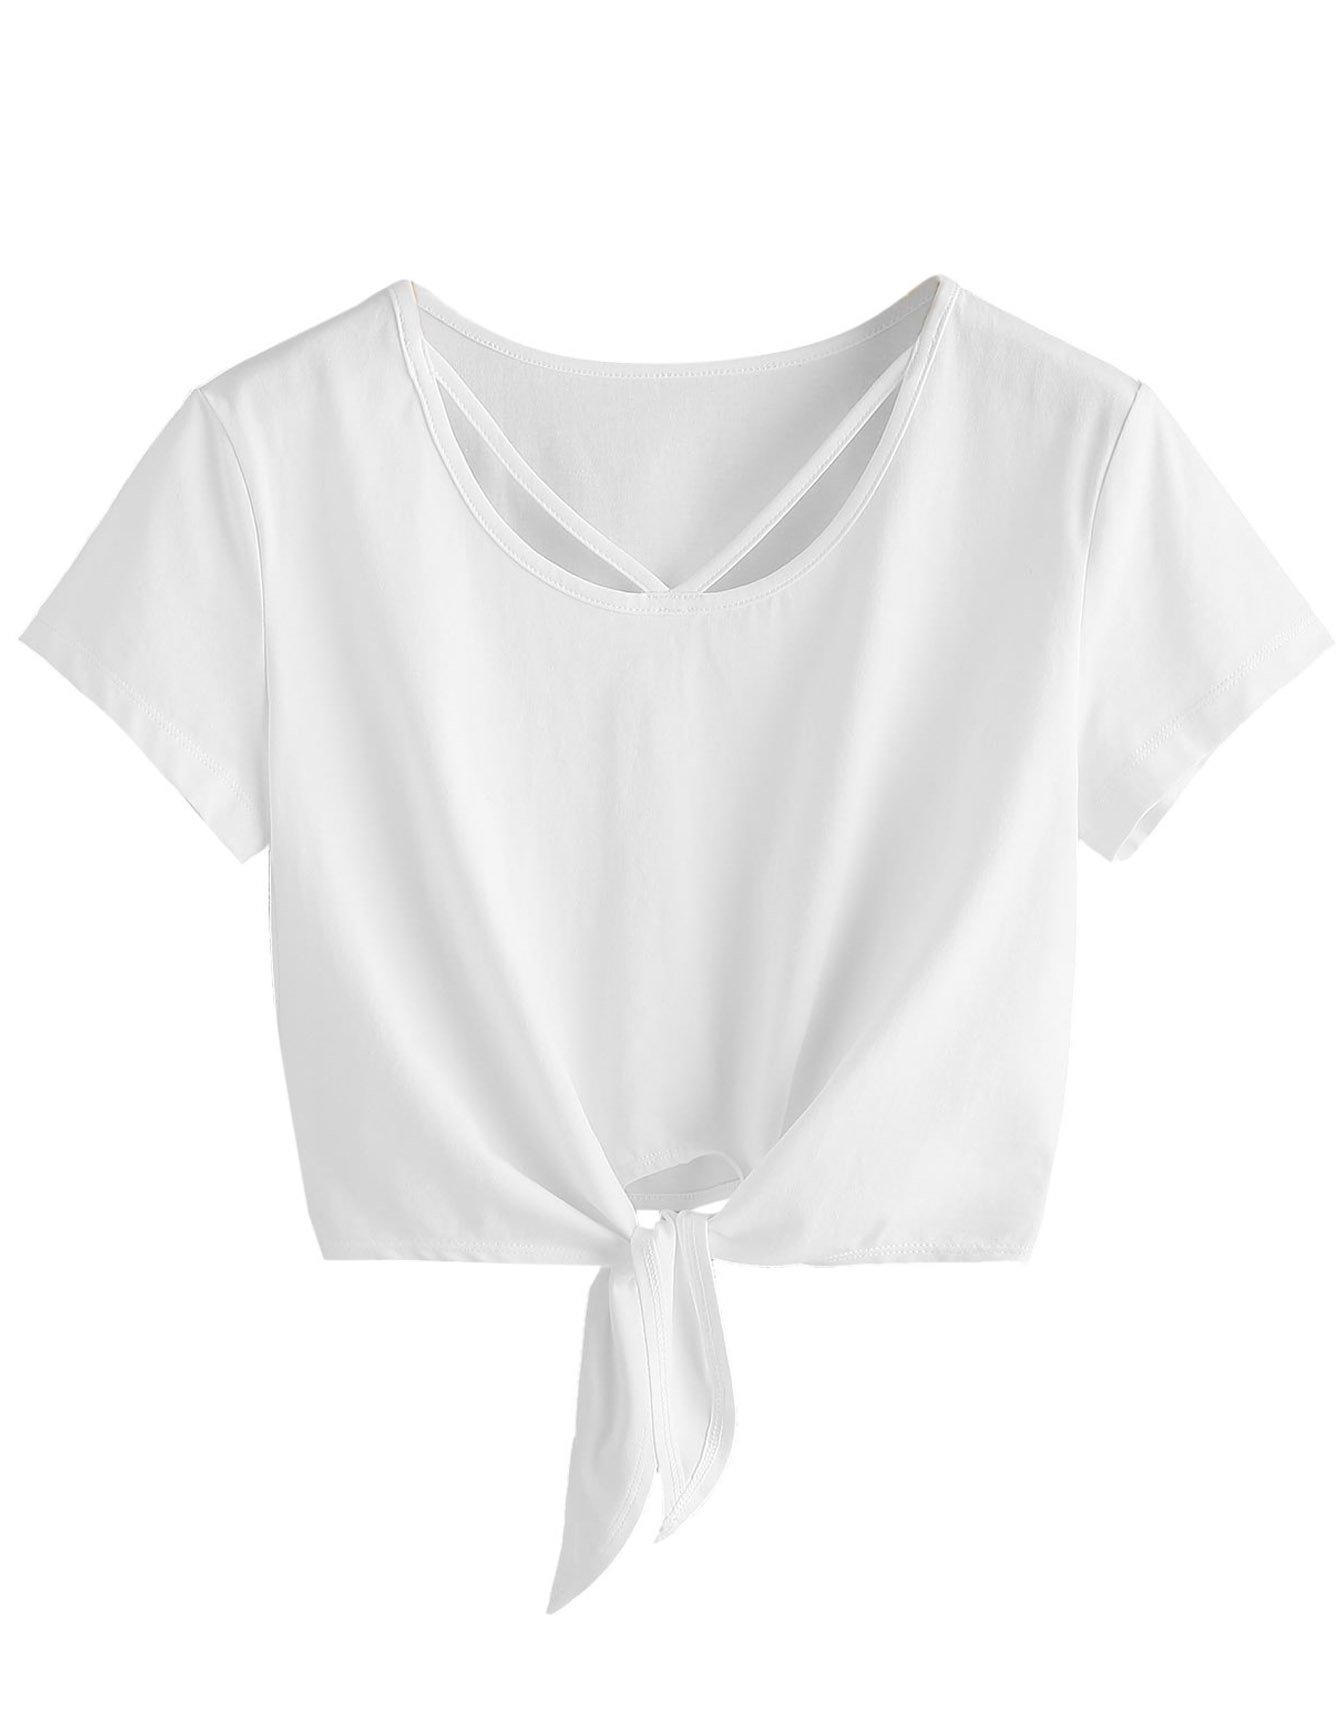 SweatyRocks Women's Loose Short Sleeve Summer Crop T-shirt Tops Blouse White#5 S